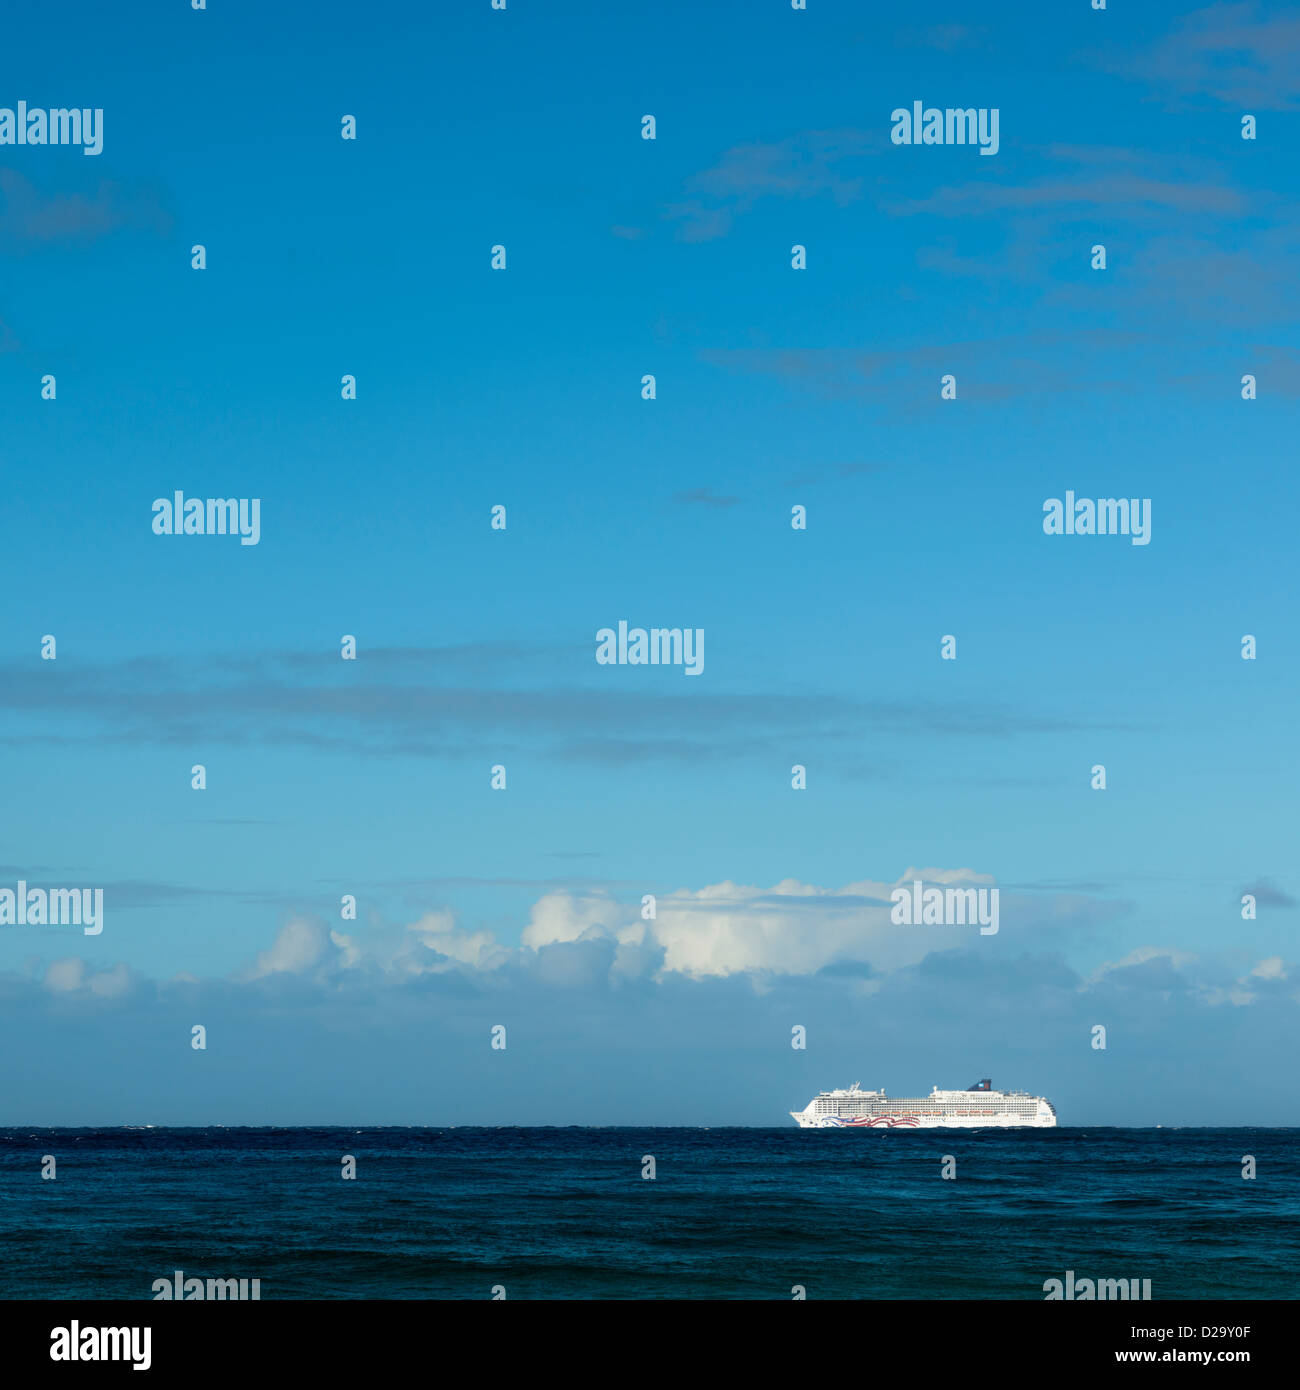 Cruise Liner, Hawaii, USA - Stock Image